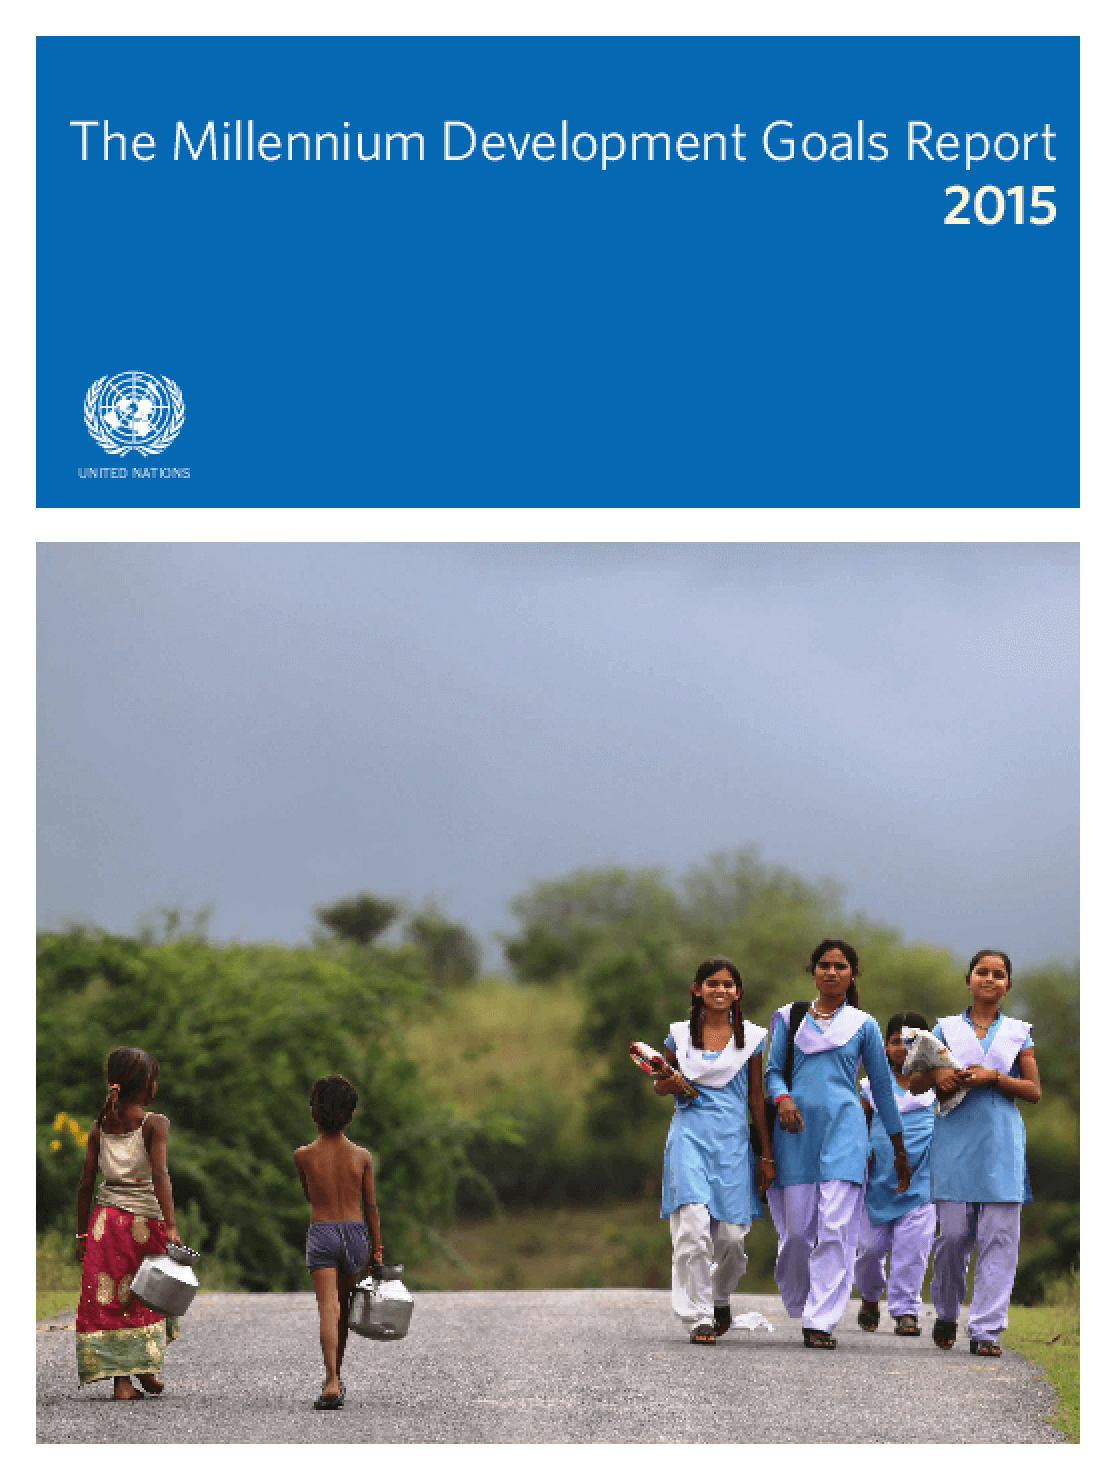 The Millennium Development Goals Report 2015